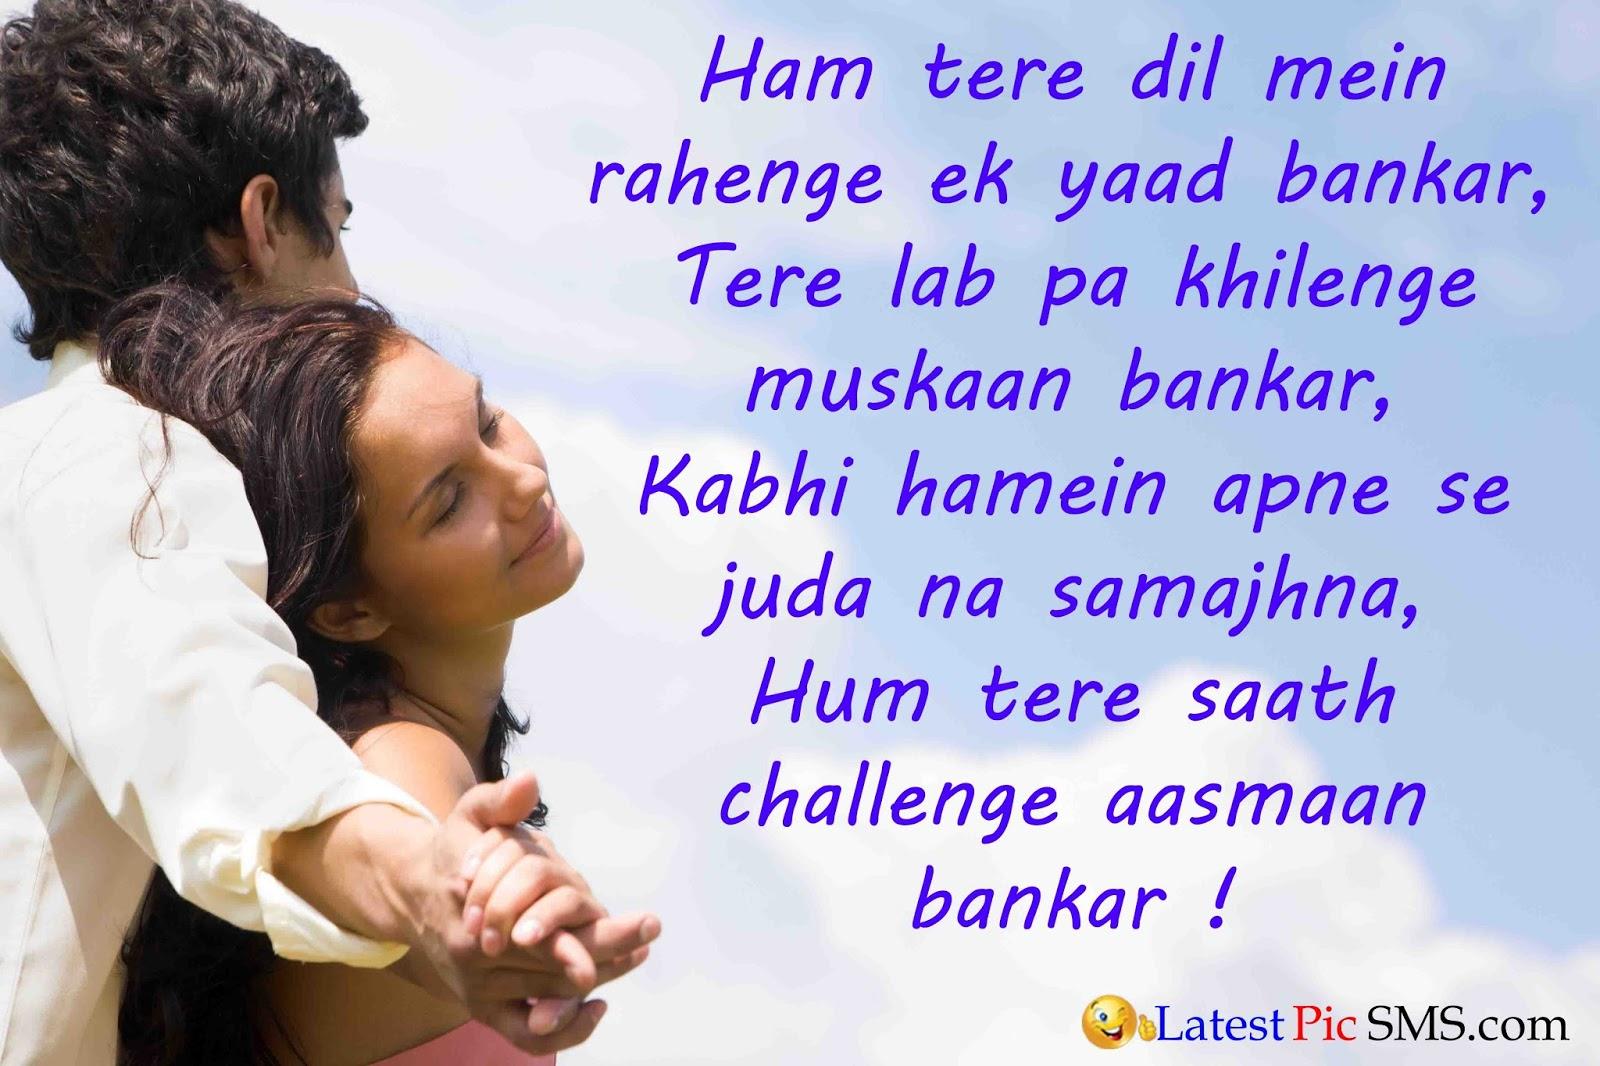 best shayari - Romantic Love Shayari for Whatsapp & Facebook